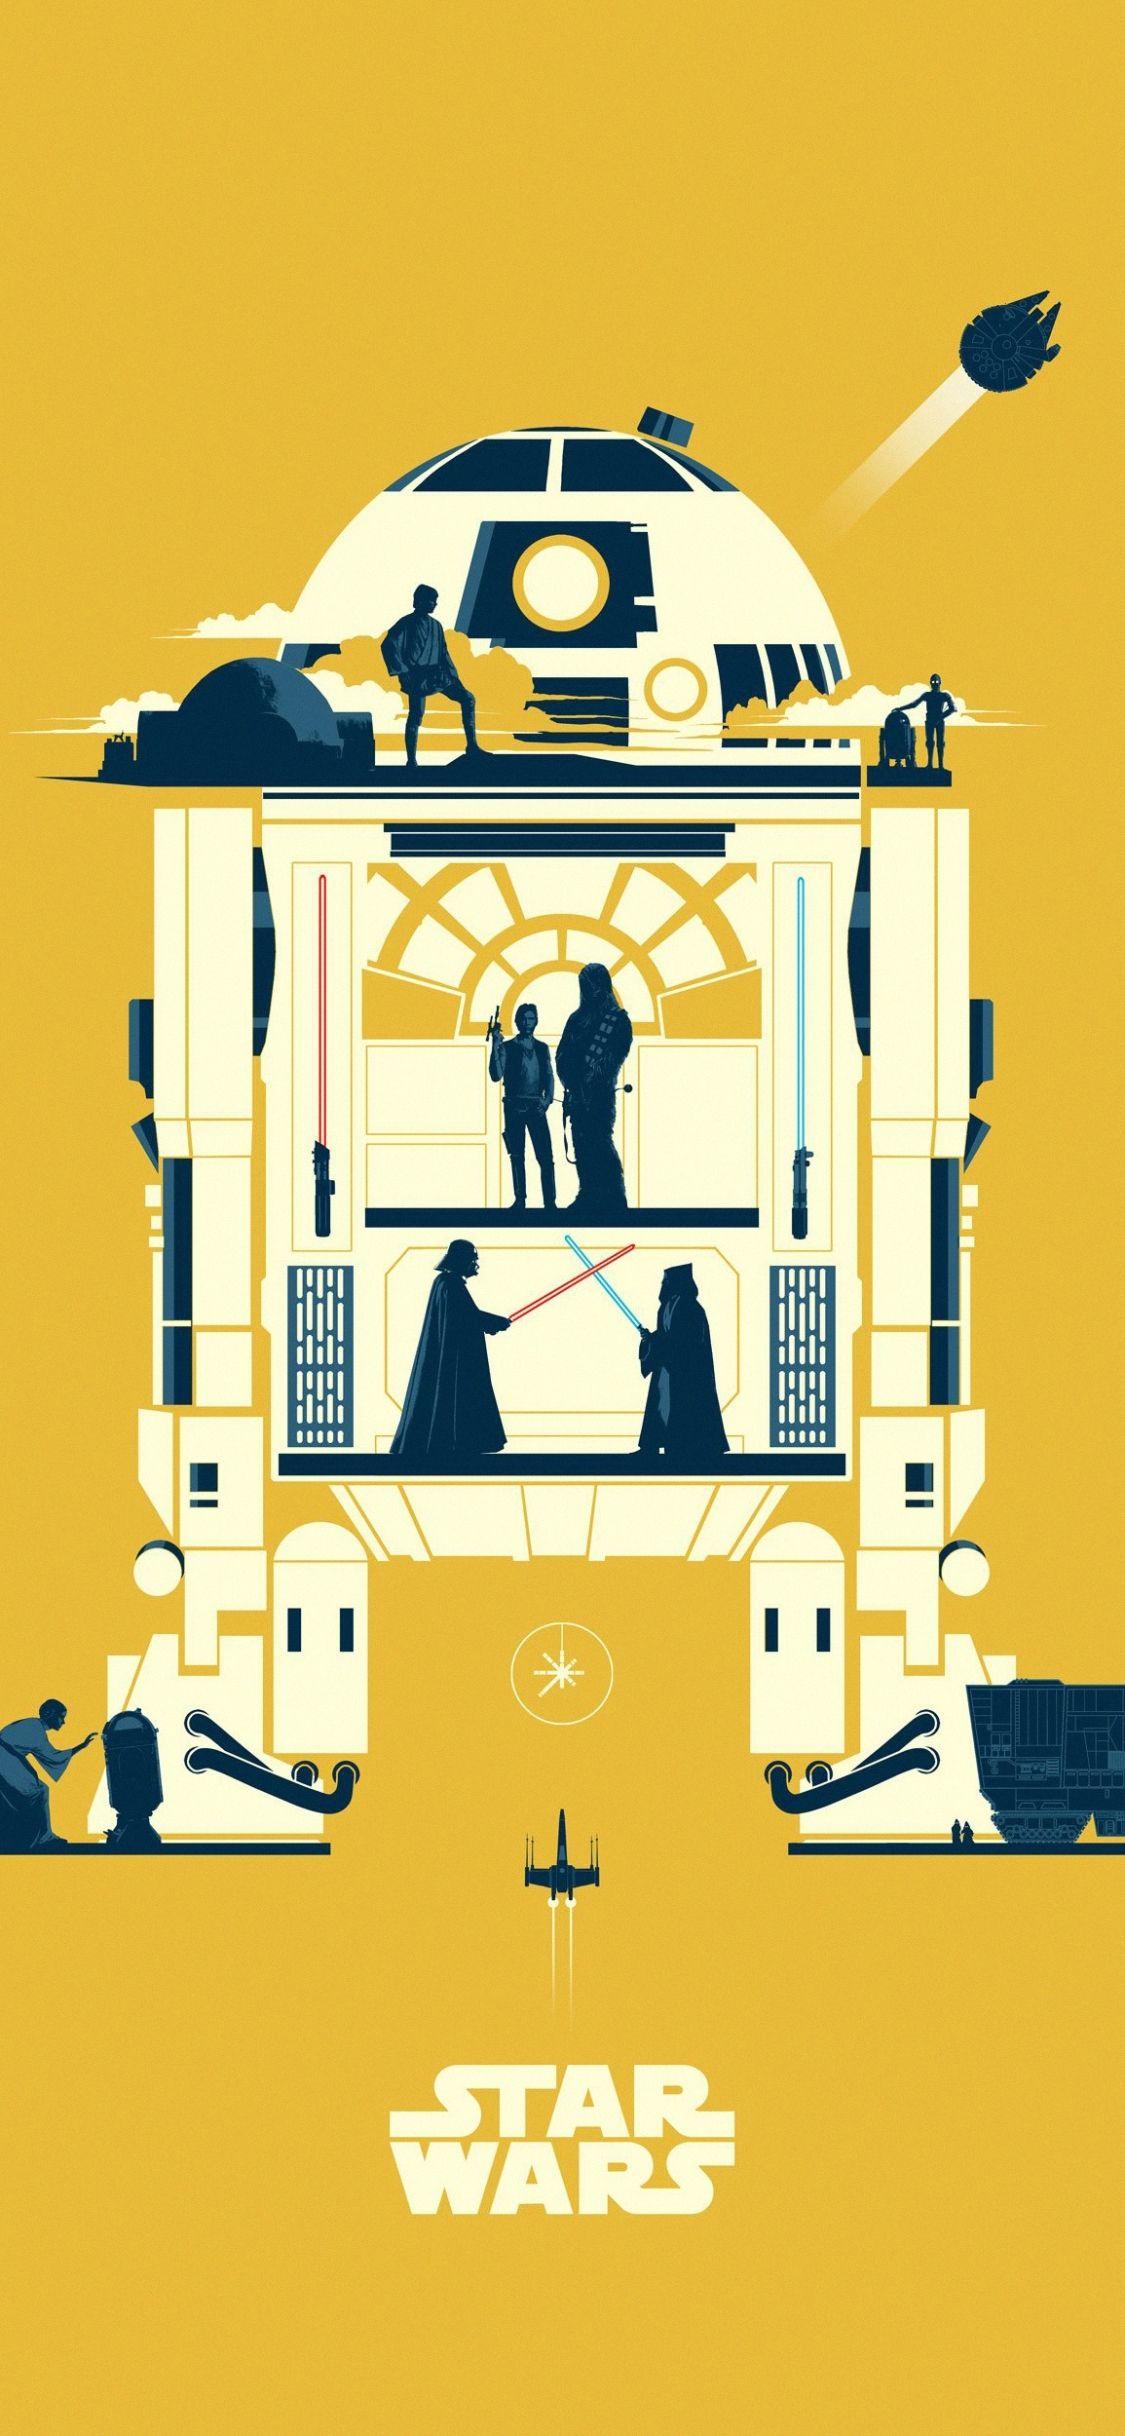 Minimalist Star Wars Mobile Wallpaper In 2020 Star Wars